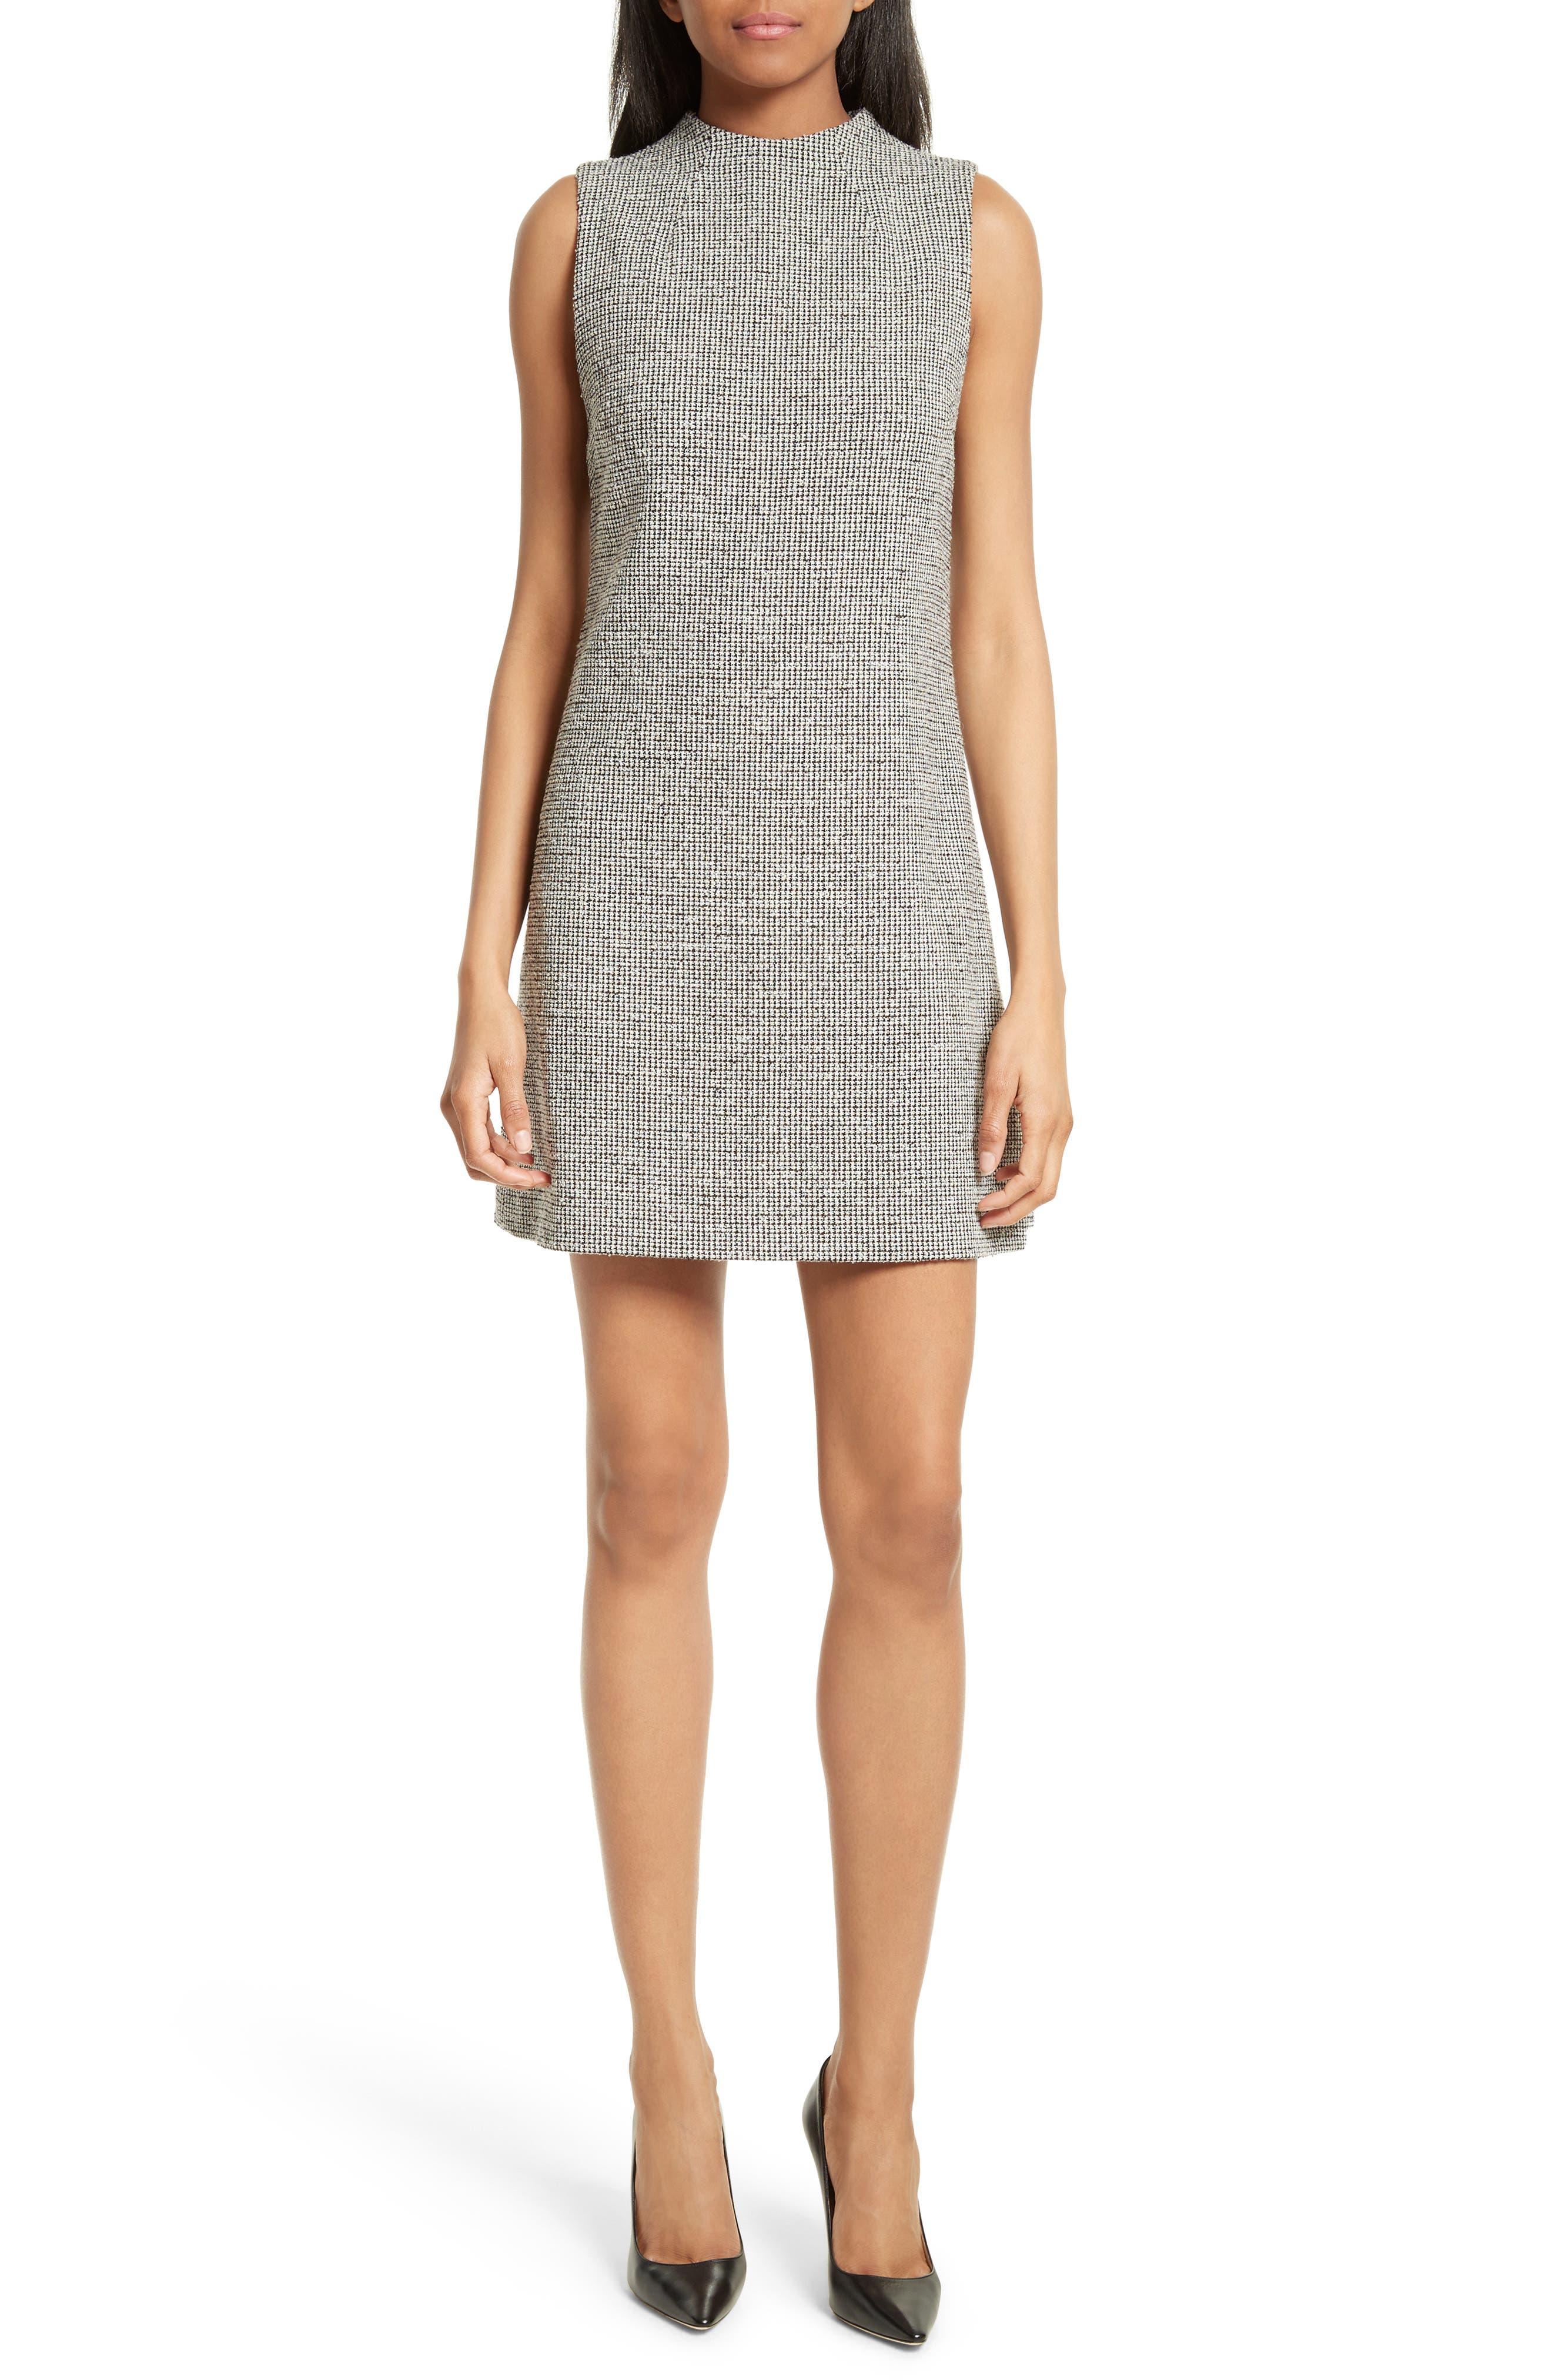 Alternate Image 1 Selected - Alice + Olivia Coley Mock Neck Dress